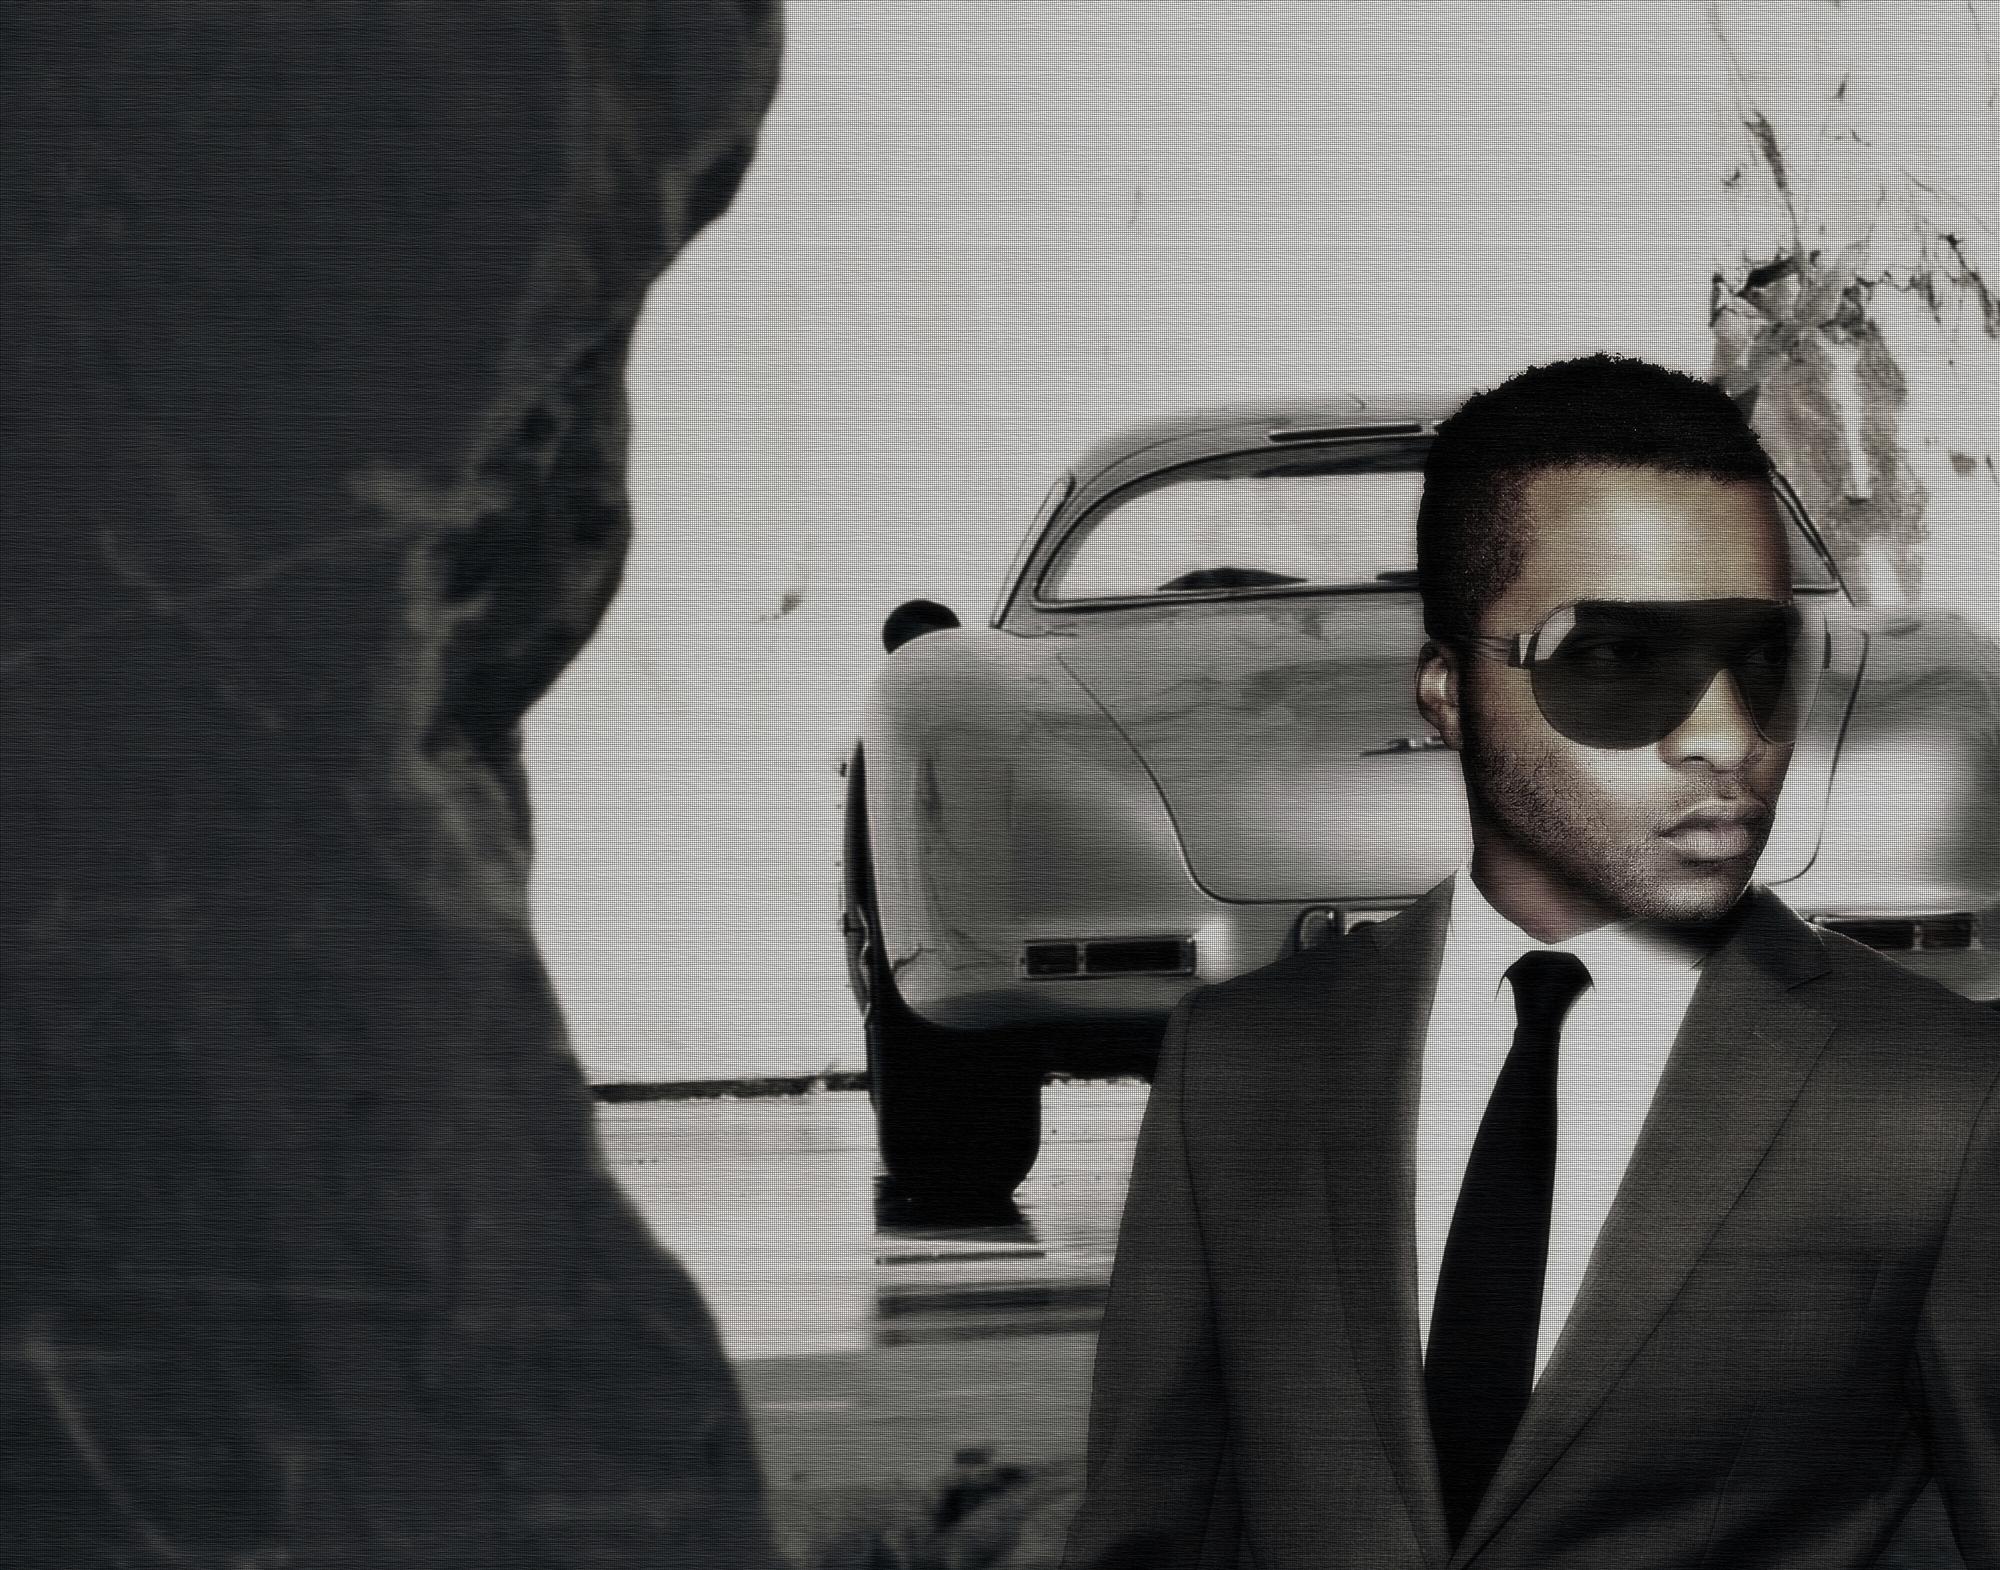 Sirius Ugo Art Images The Young James Bond Car Hd Wallpaper And